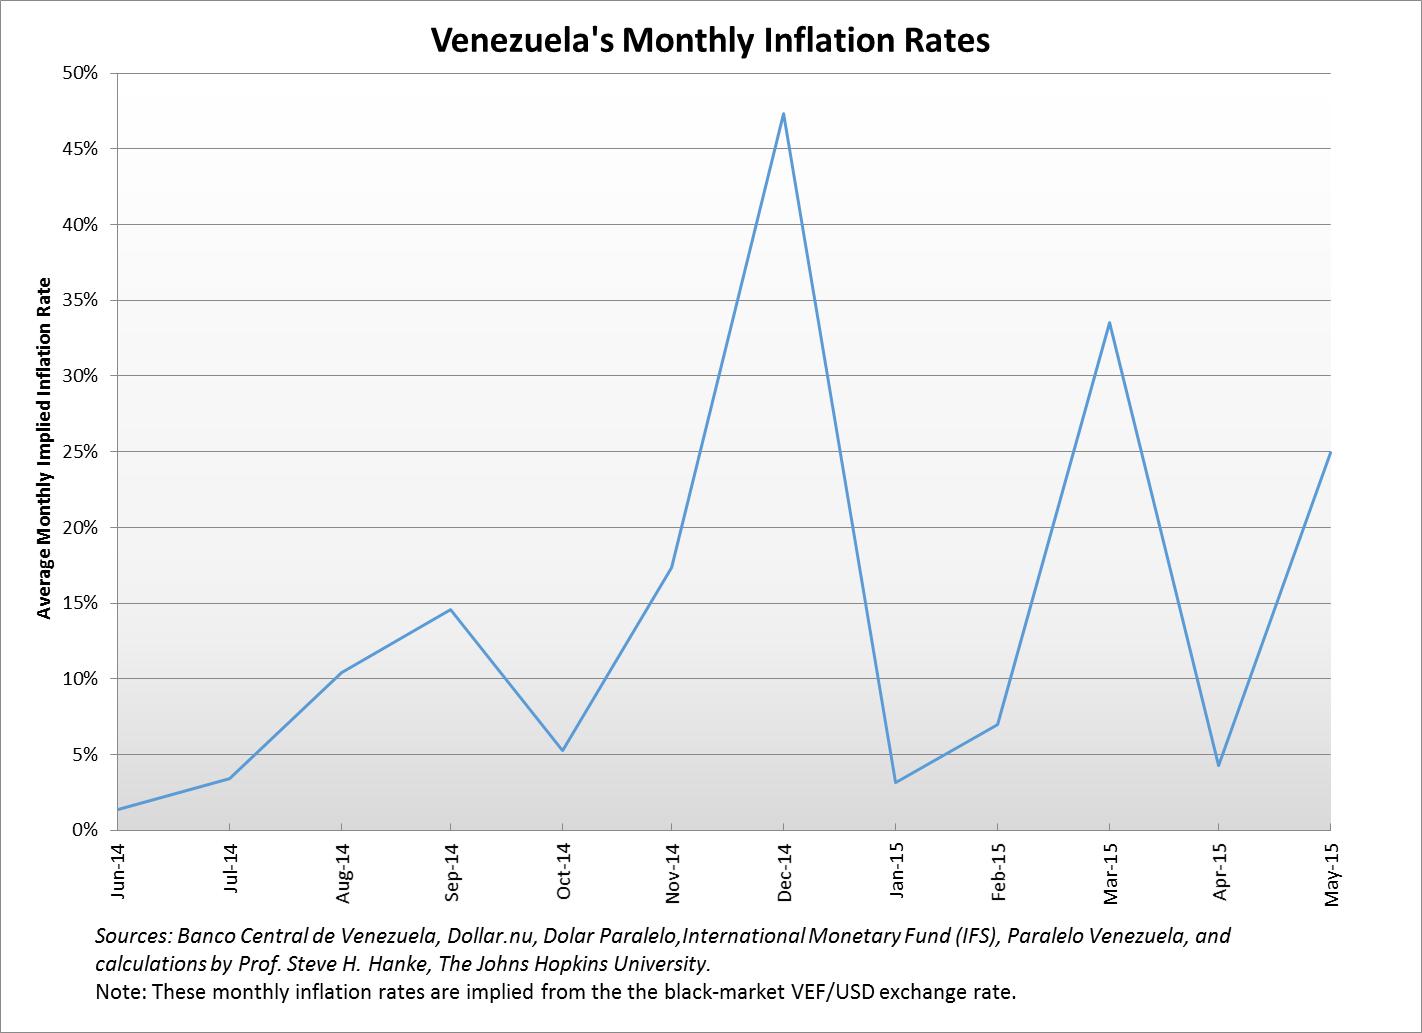 Venezuela's Monthly Inflation Rates